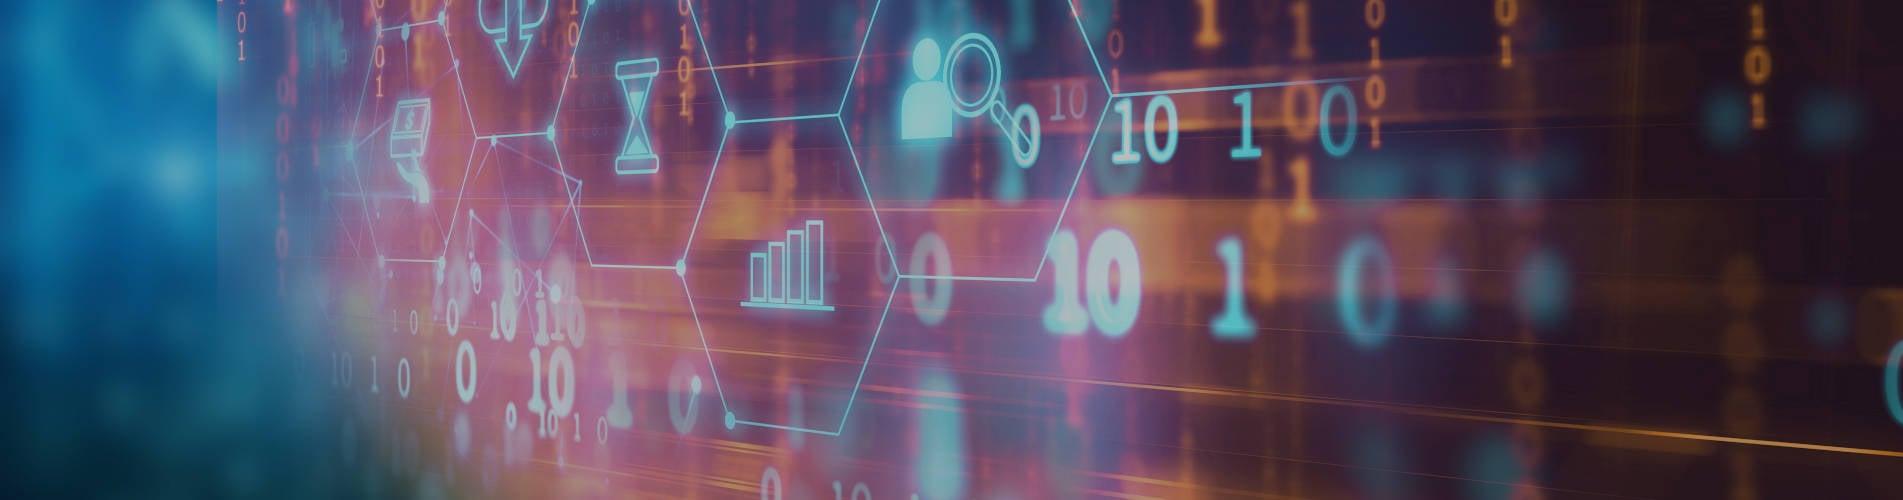 inline-policy-data-banner-2